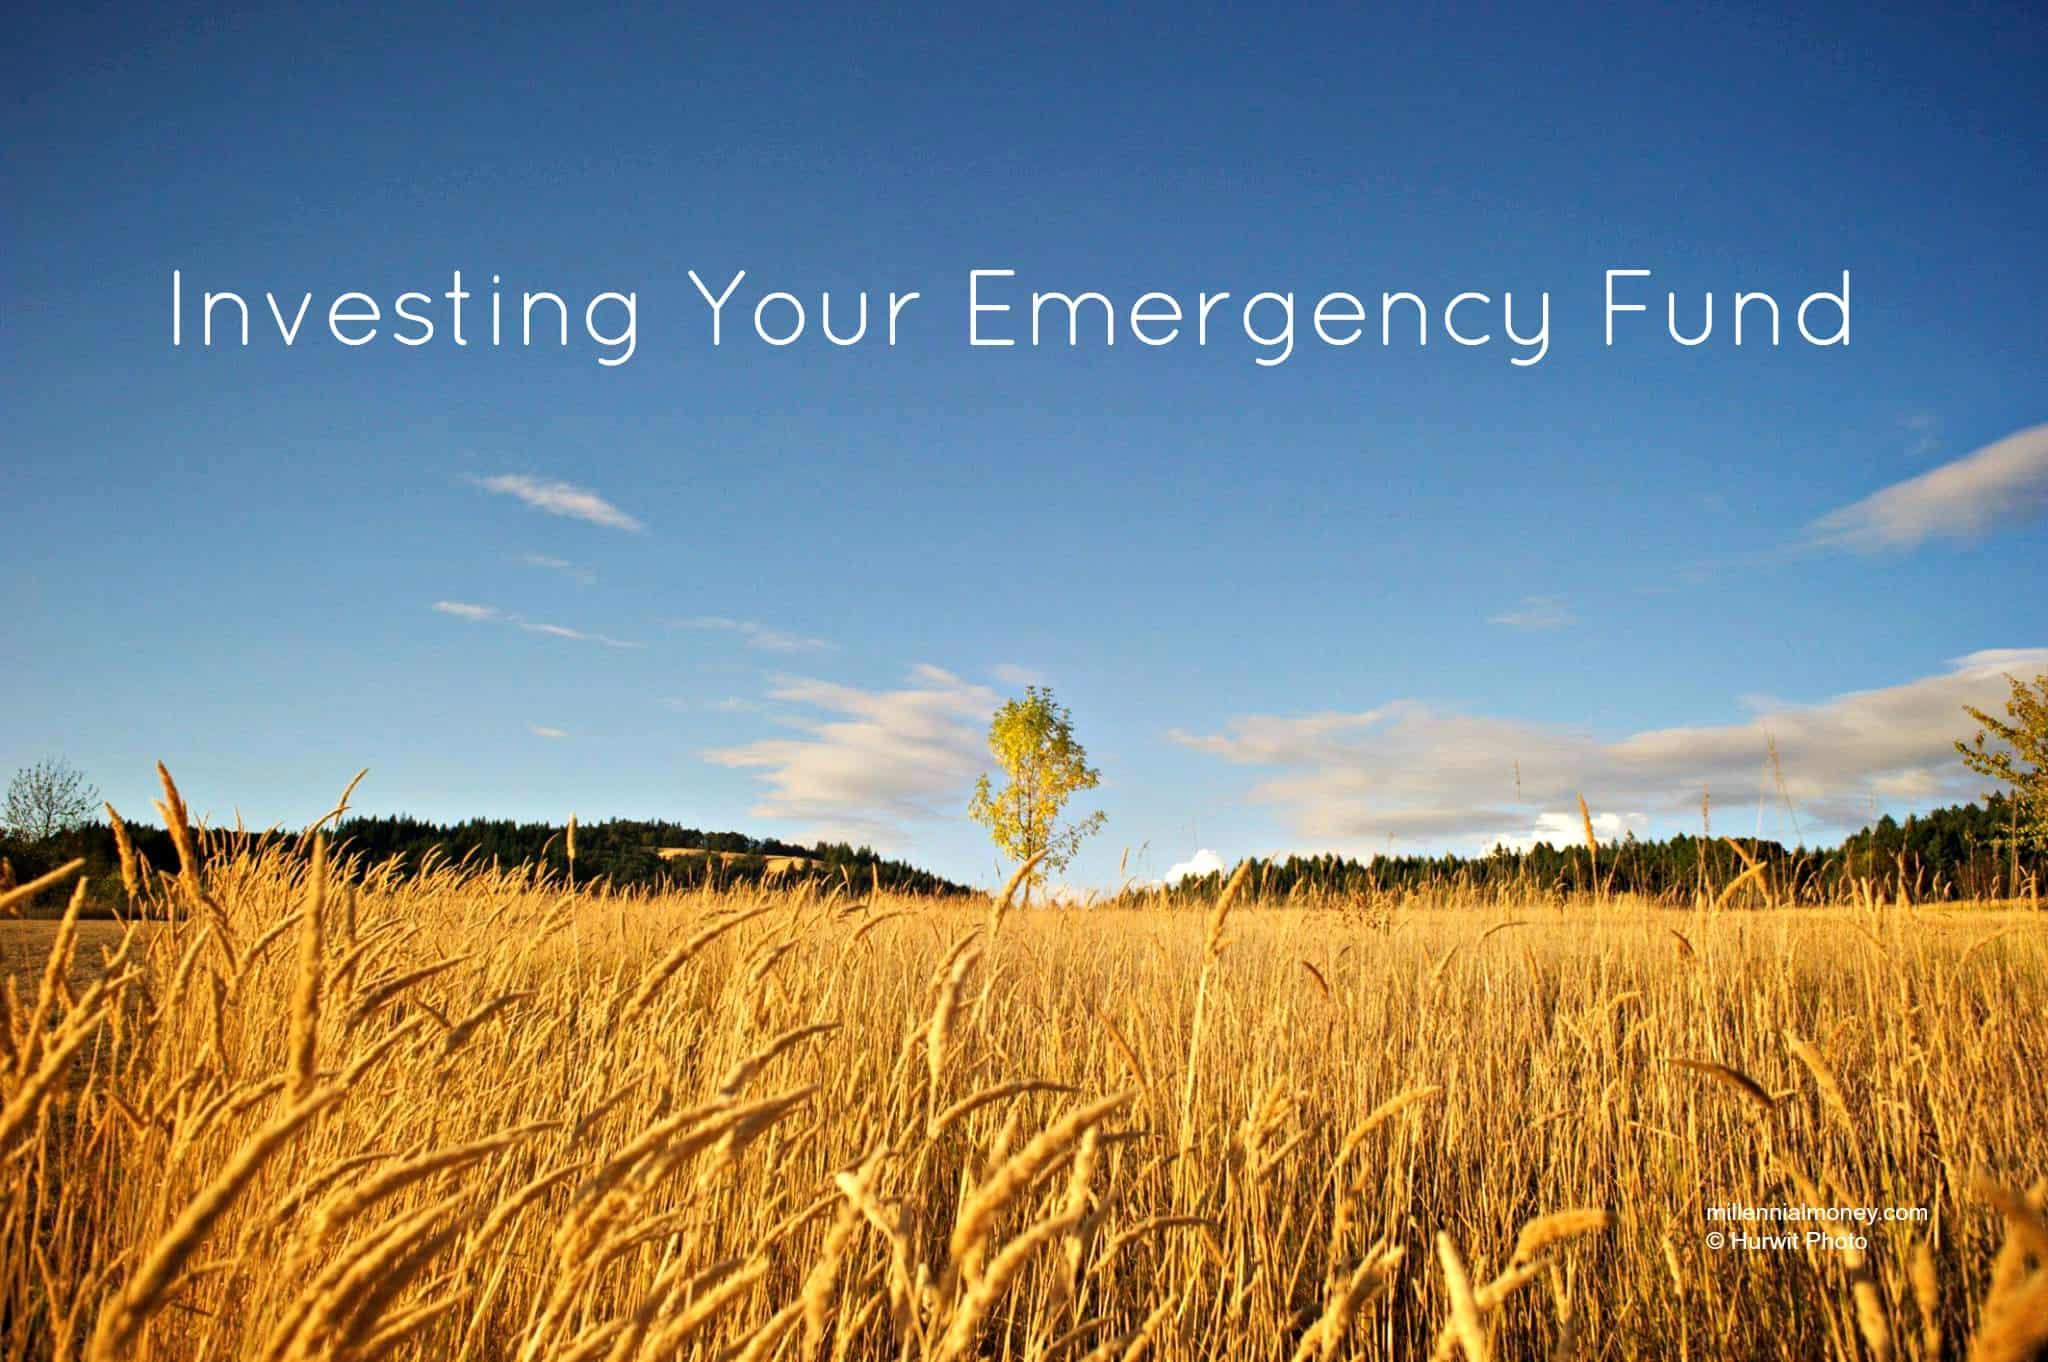 Investing Emergency Fund